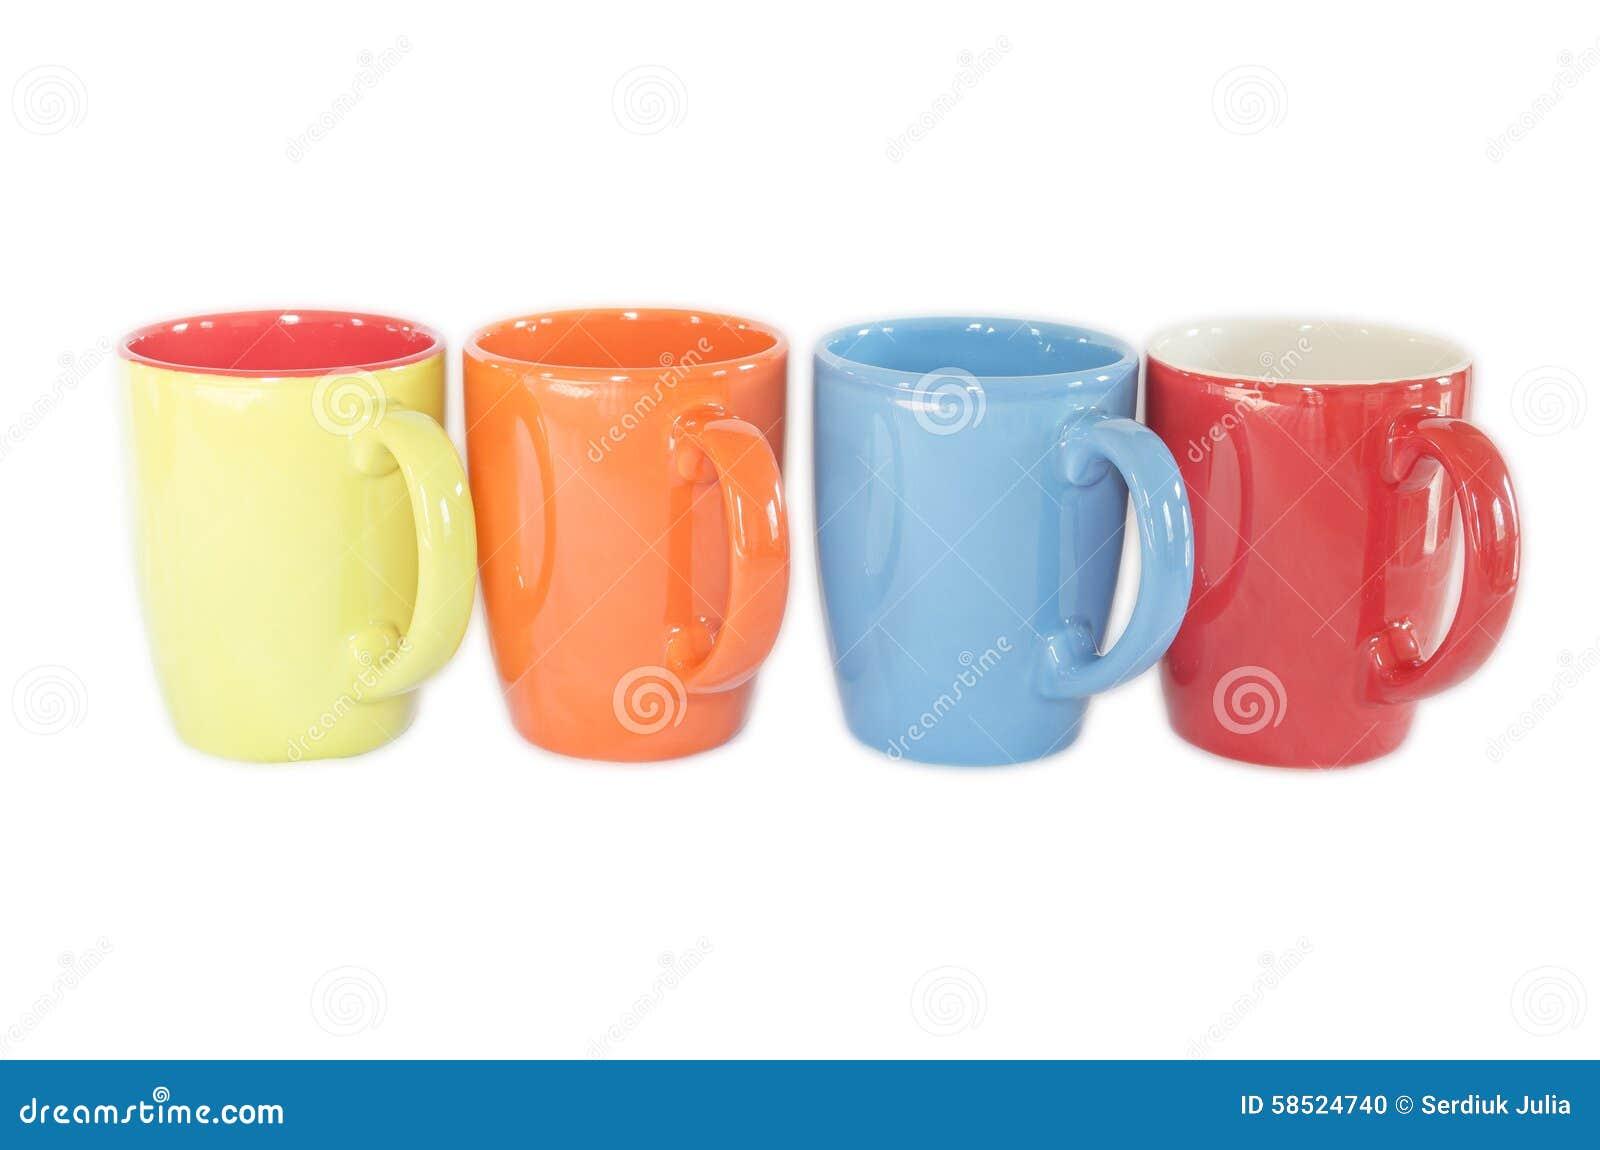 colorful coffee mugs - Colorful Mugs